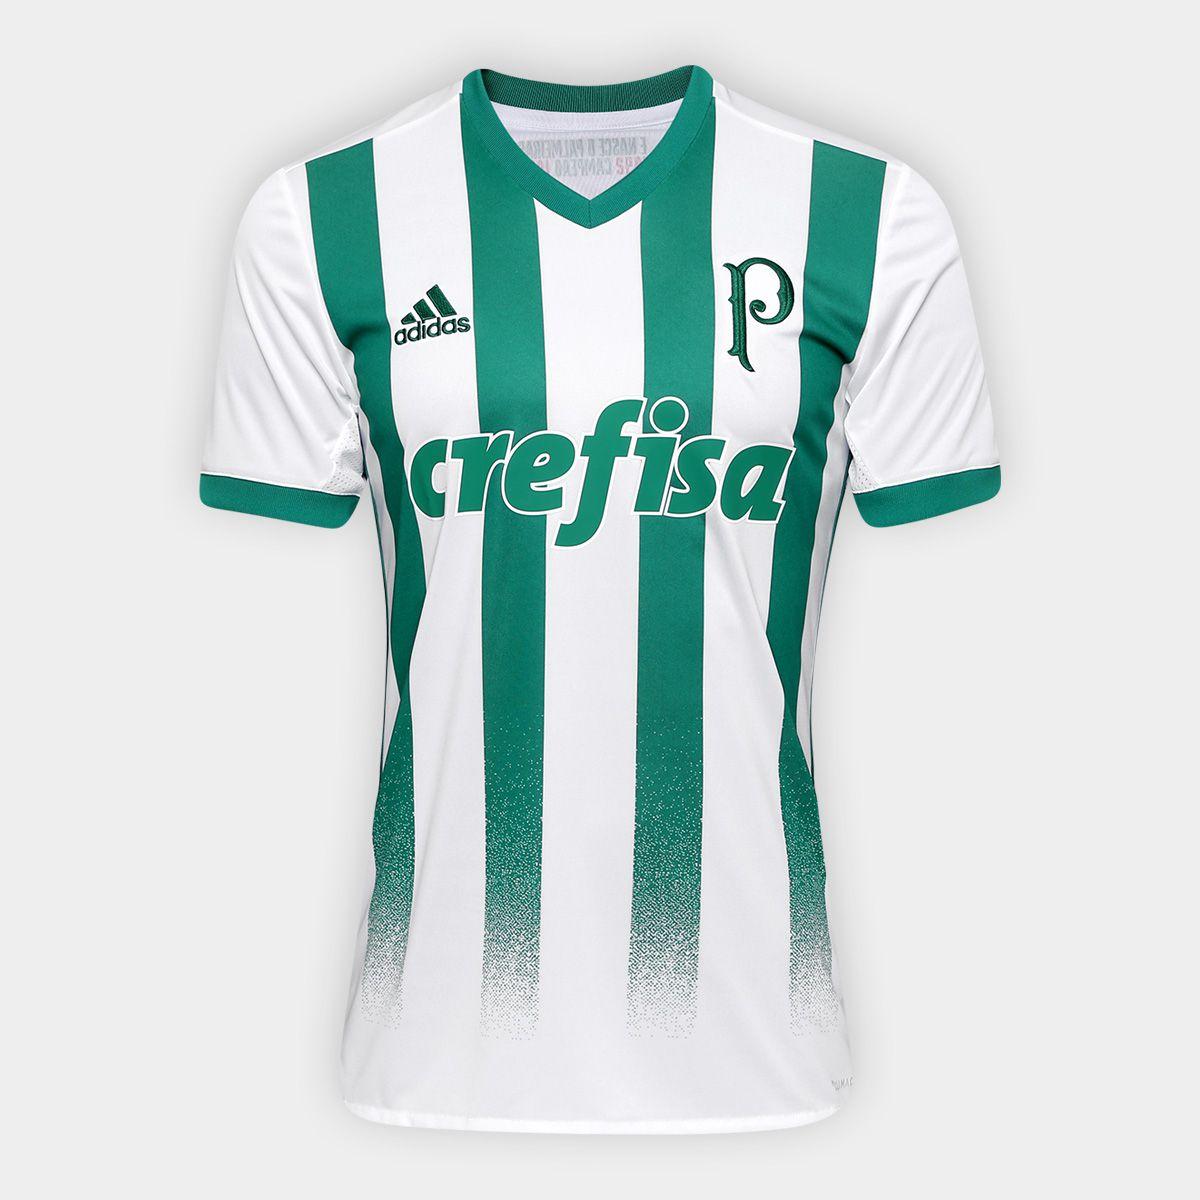 cbc3ed4b68abe Camisa Masculina Adidas Palmeiras Ii Torcedor - BRACIA SHOP  Loja de ...